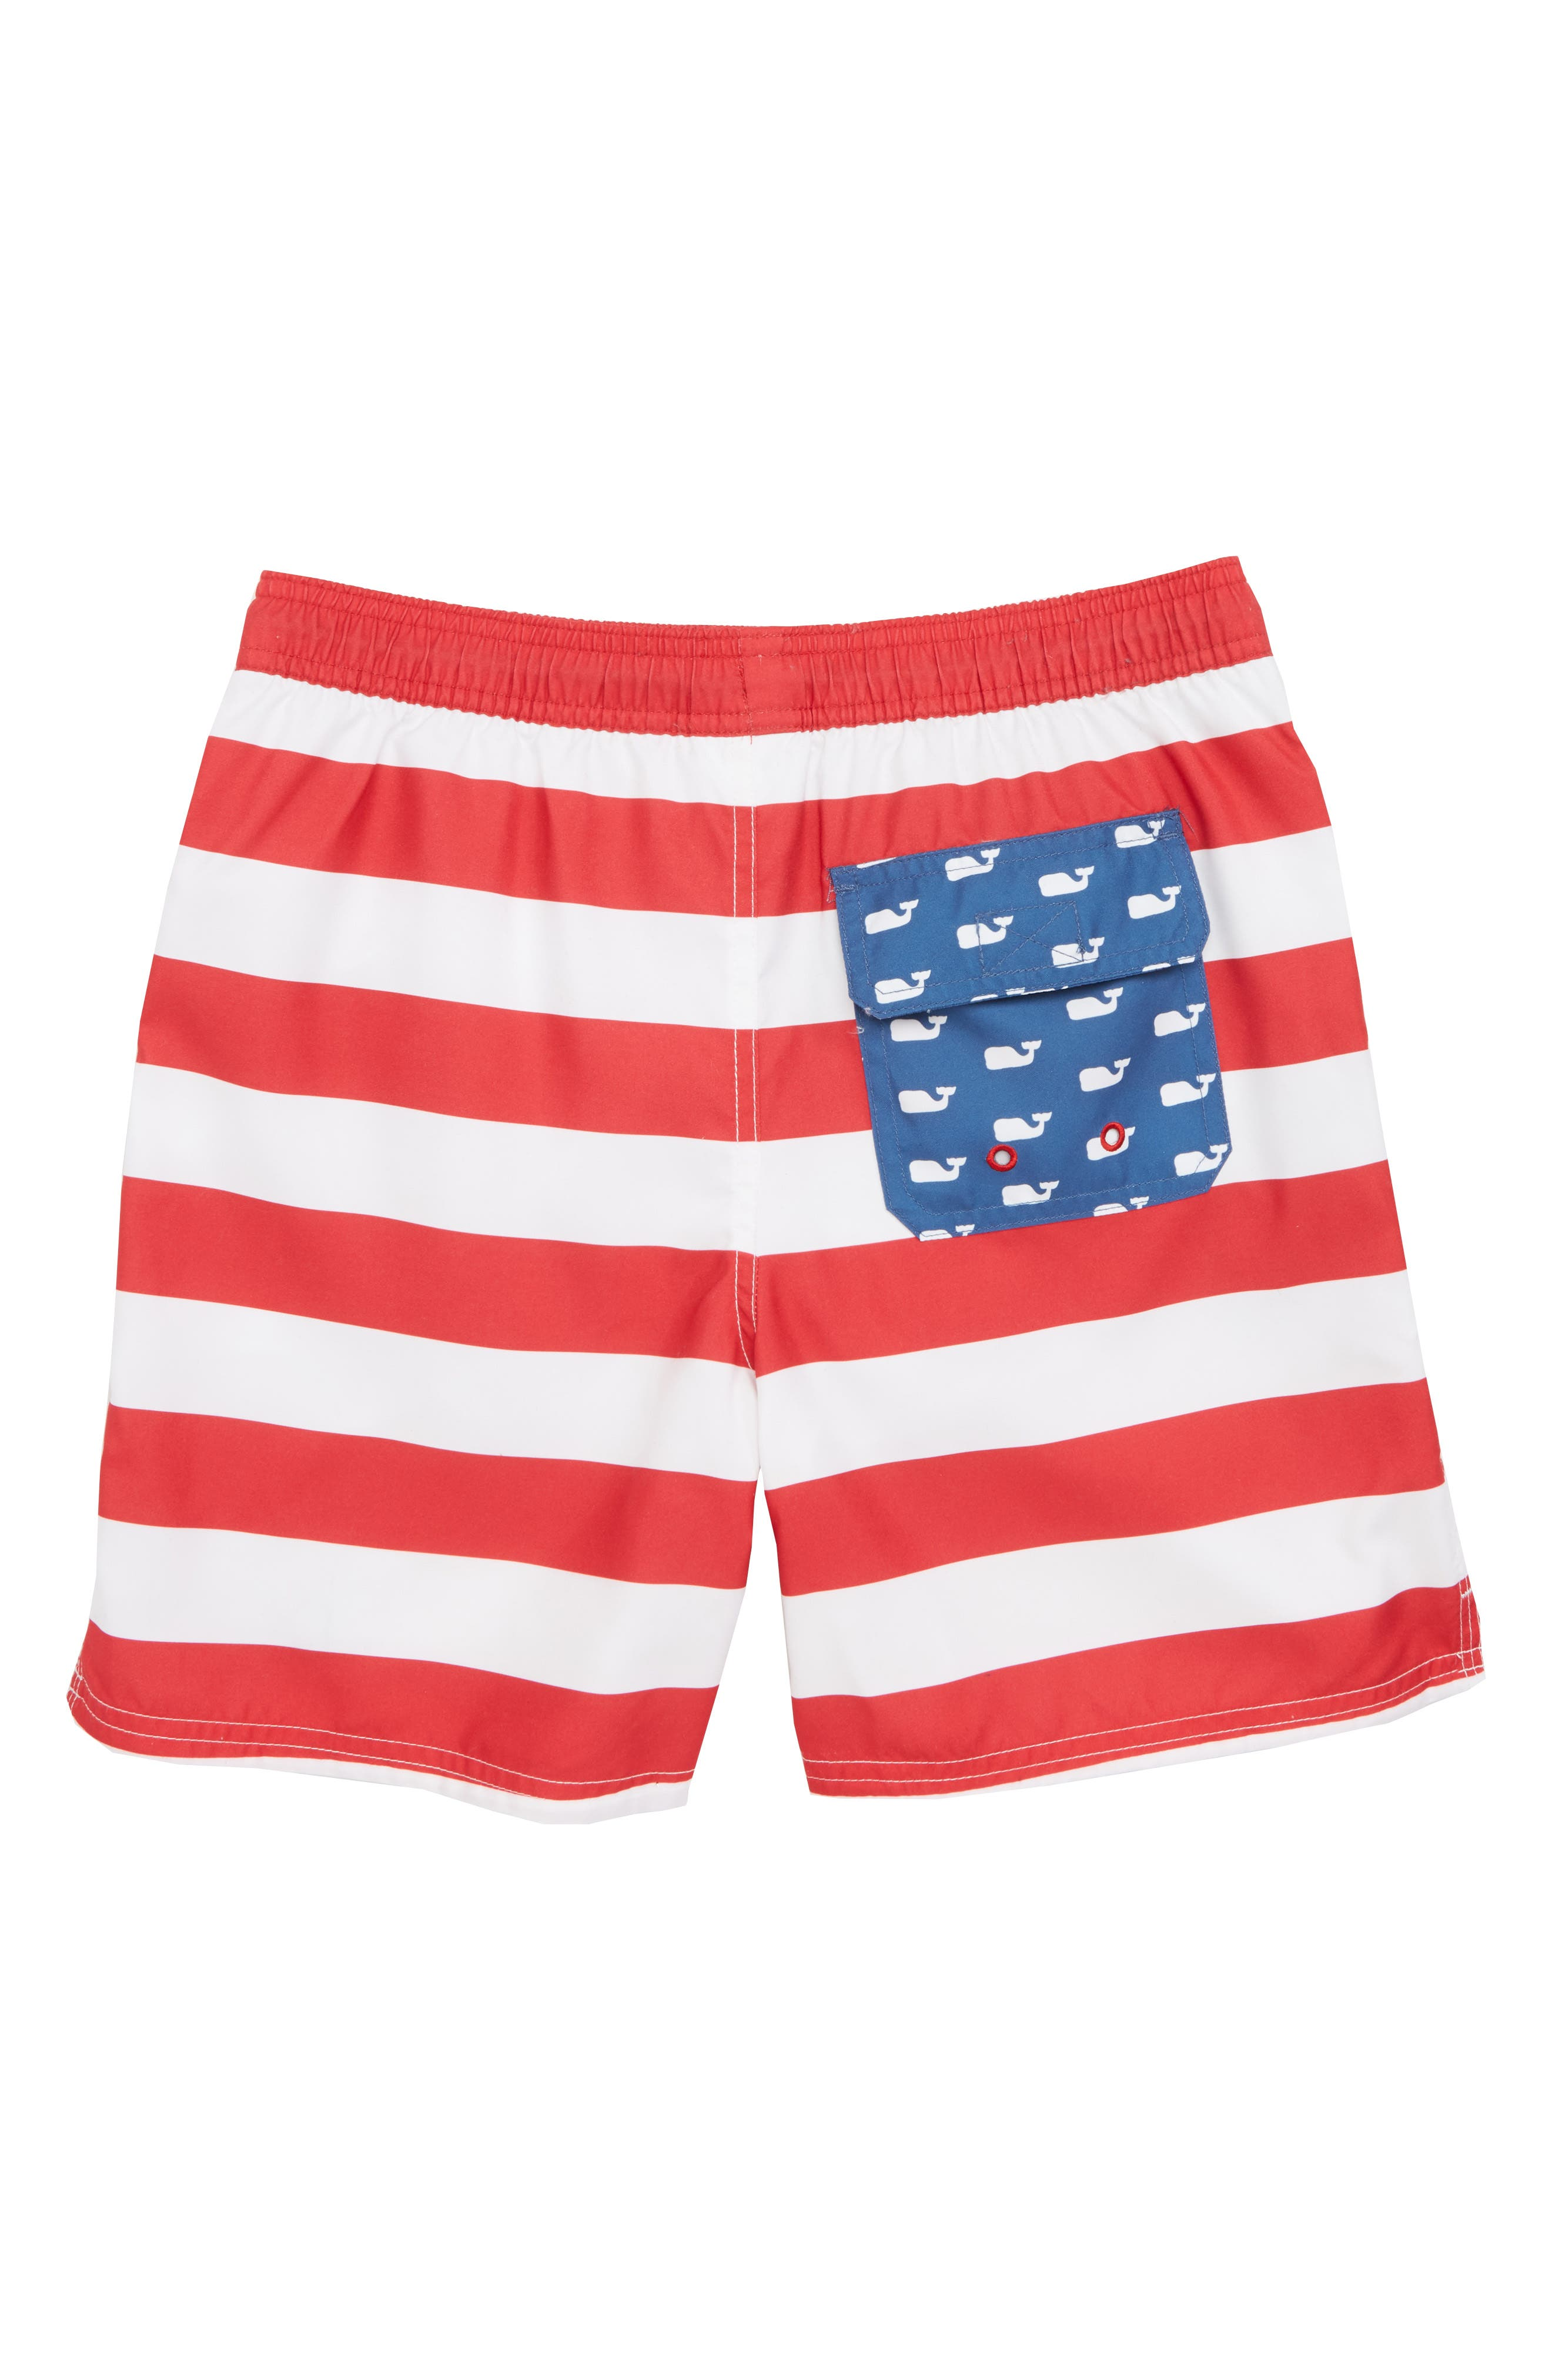 VINEYARD VINES,                             Chappy USA Flag Swim Trunks,                             Alternate thumbnail 2, color,                             461